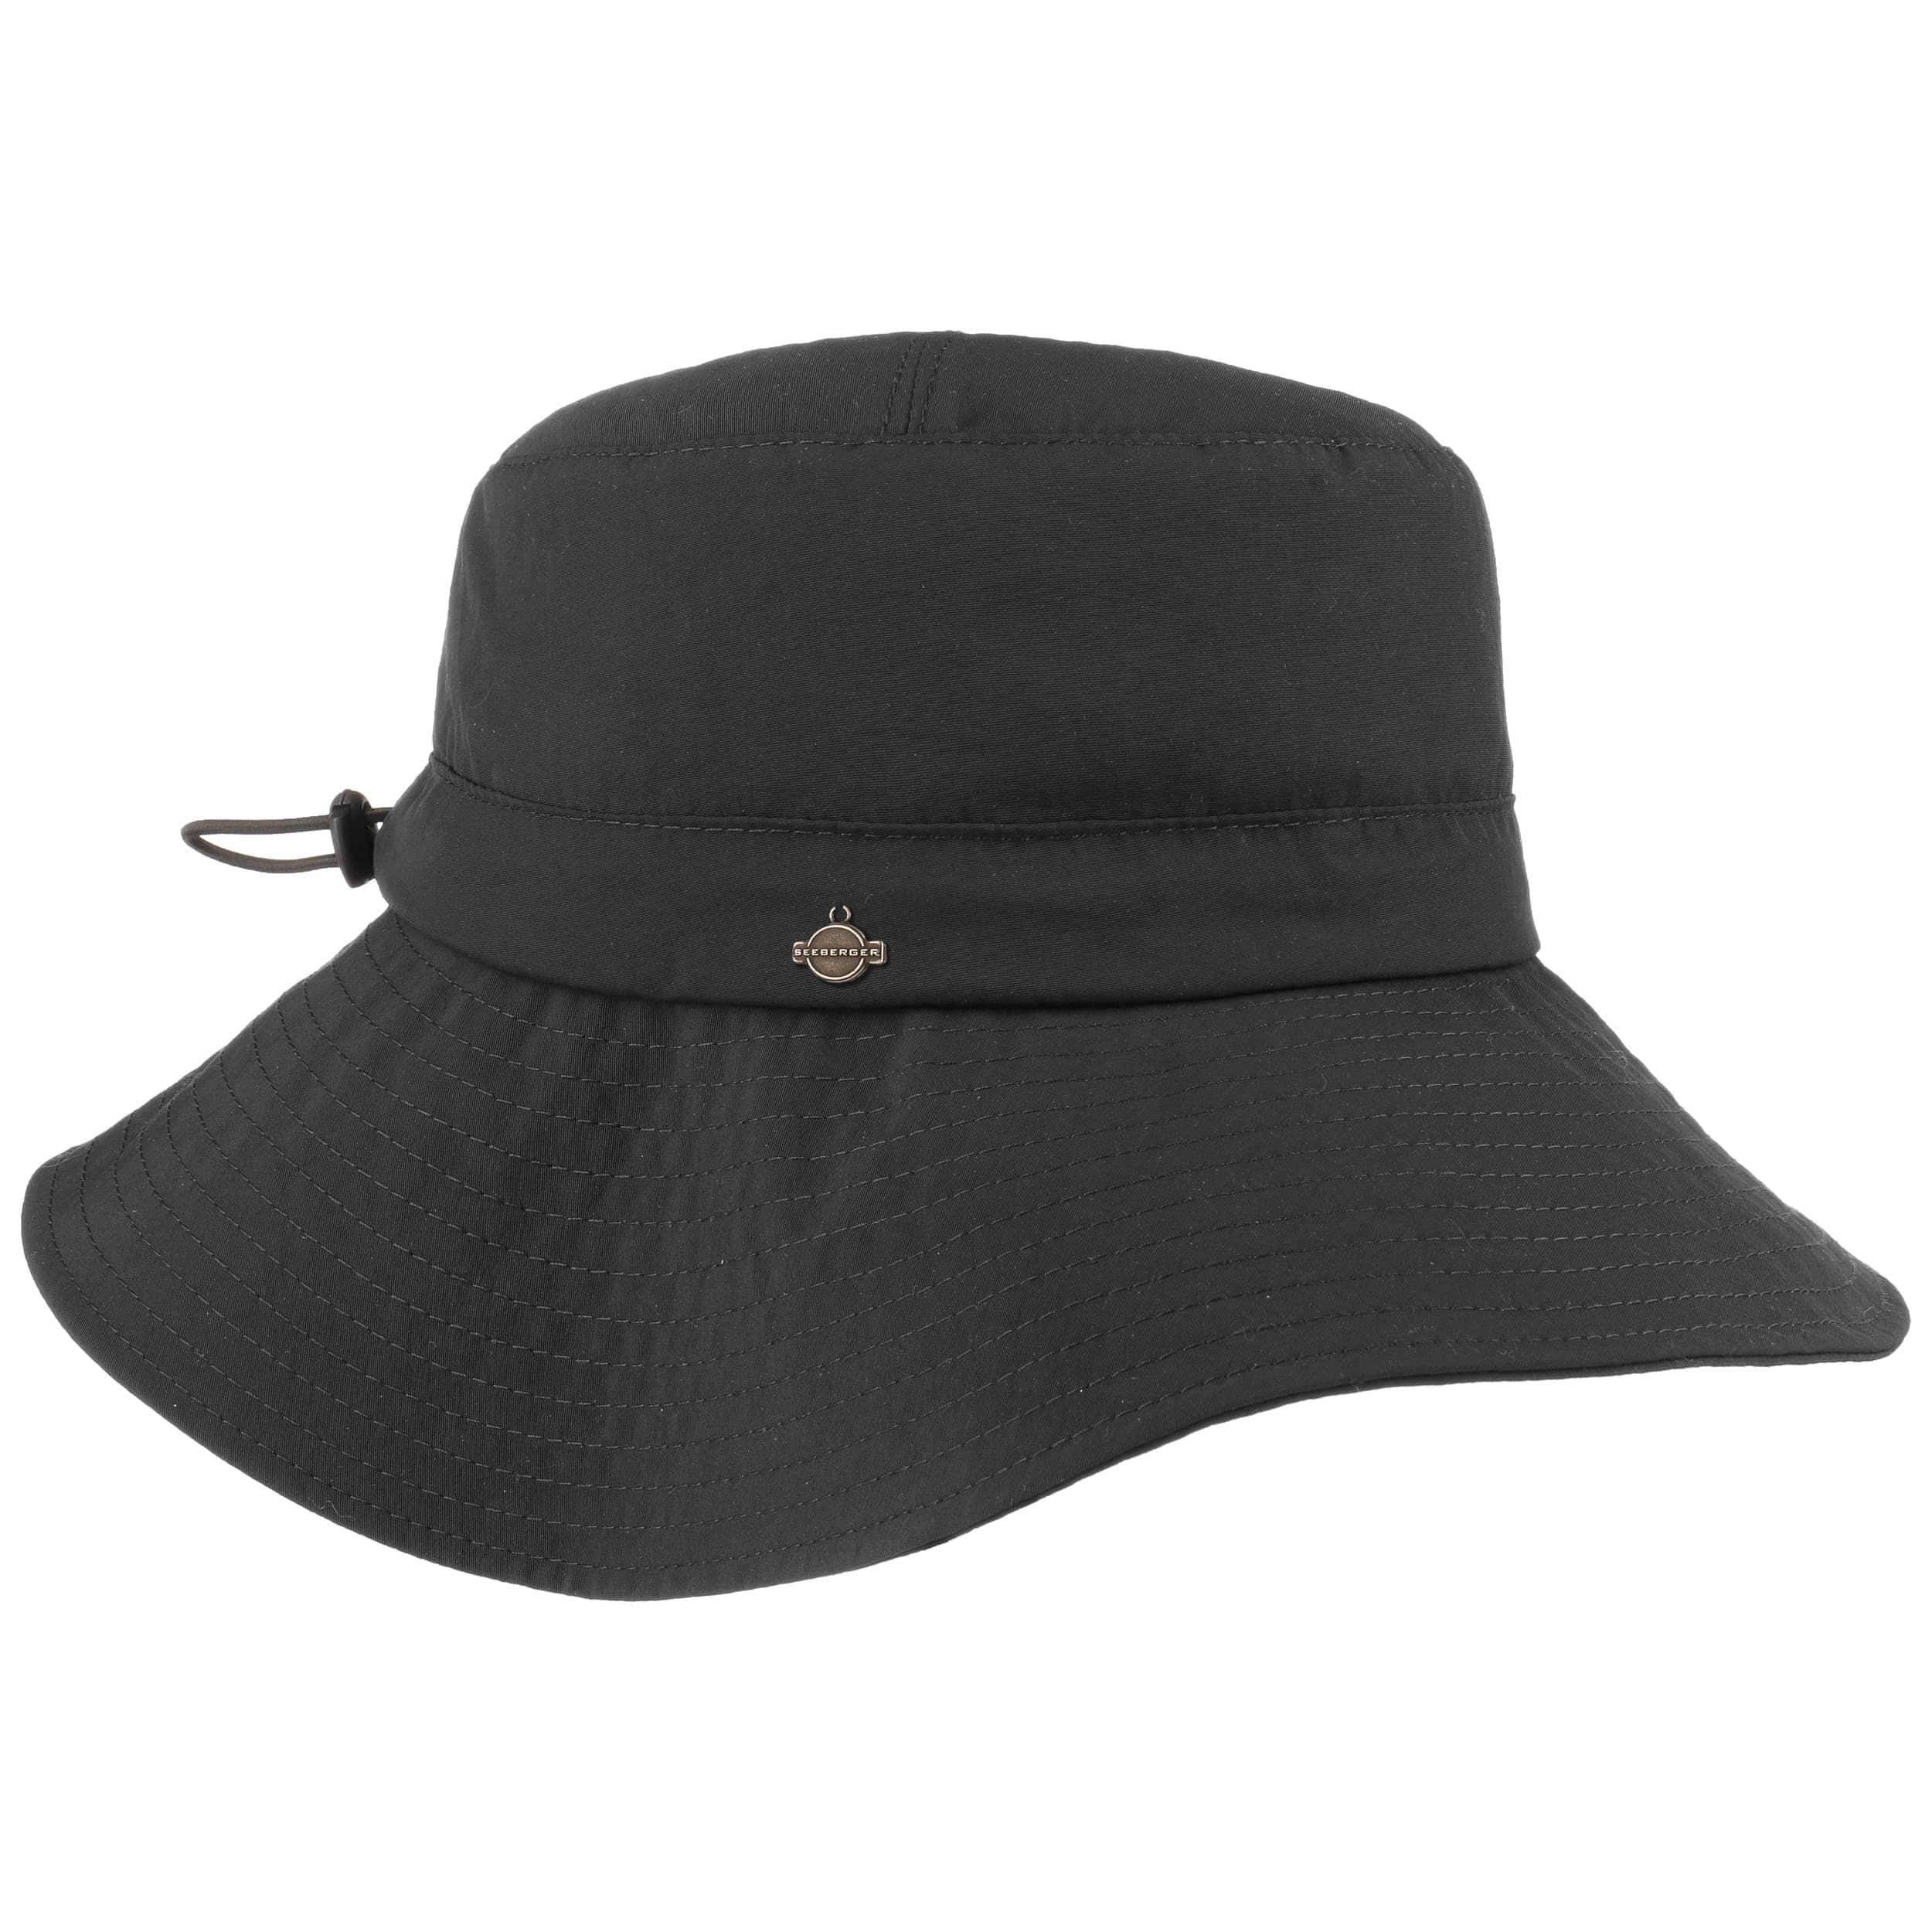 d35f6b1c675b9 Sombrero Ala Ancha Anti-Rain by Seeberger - Sombreros - sombreroshop.es